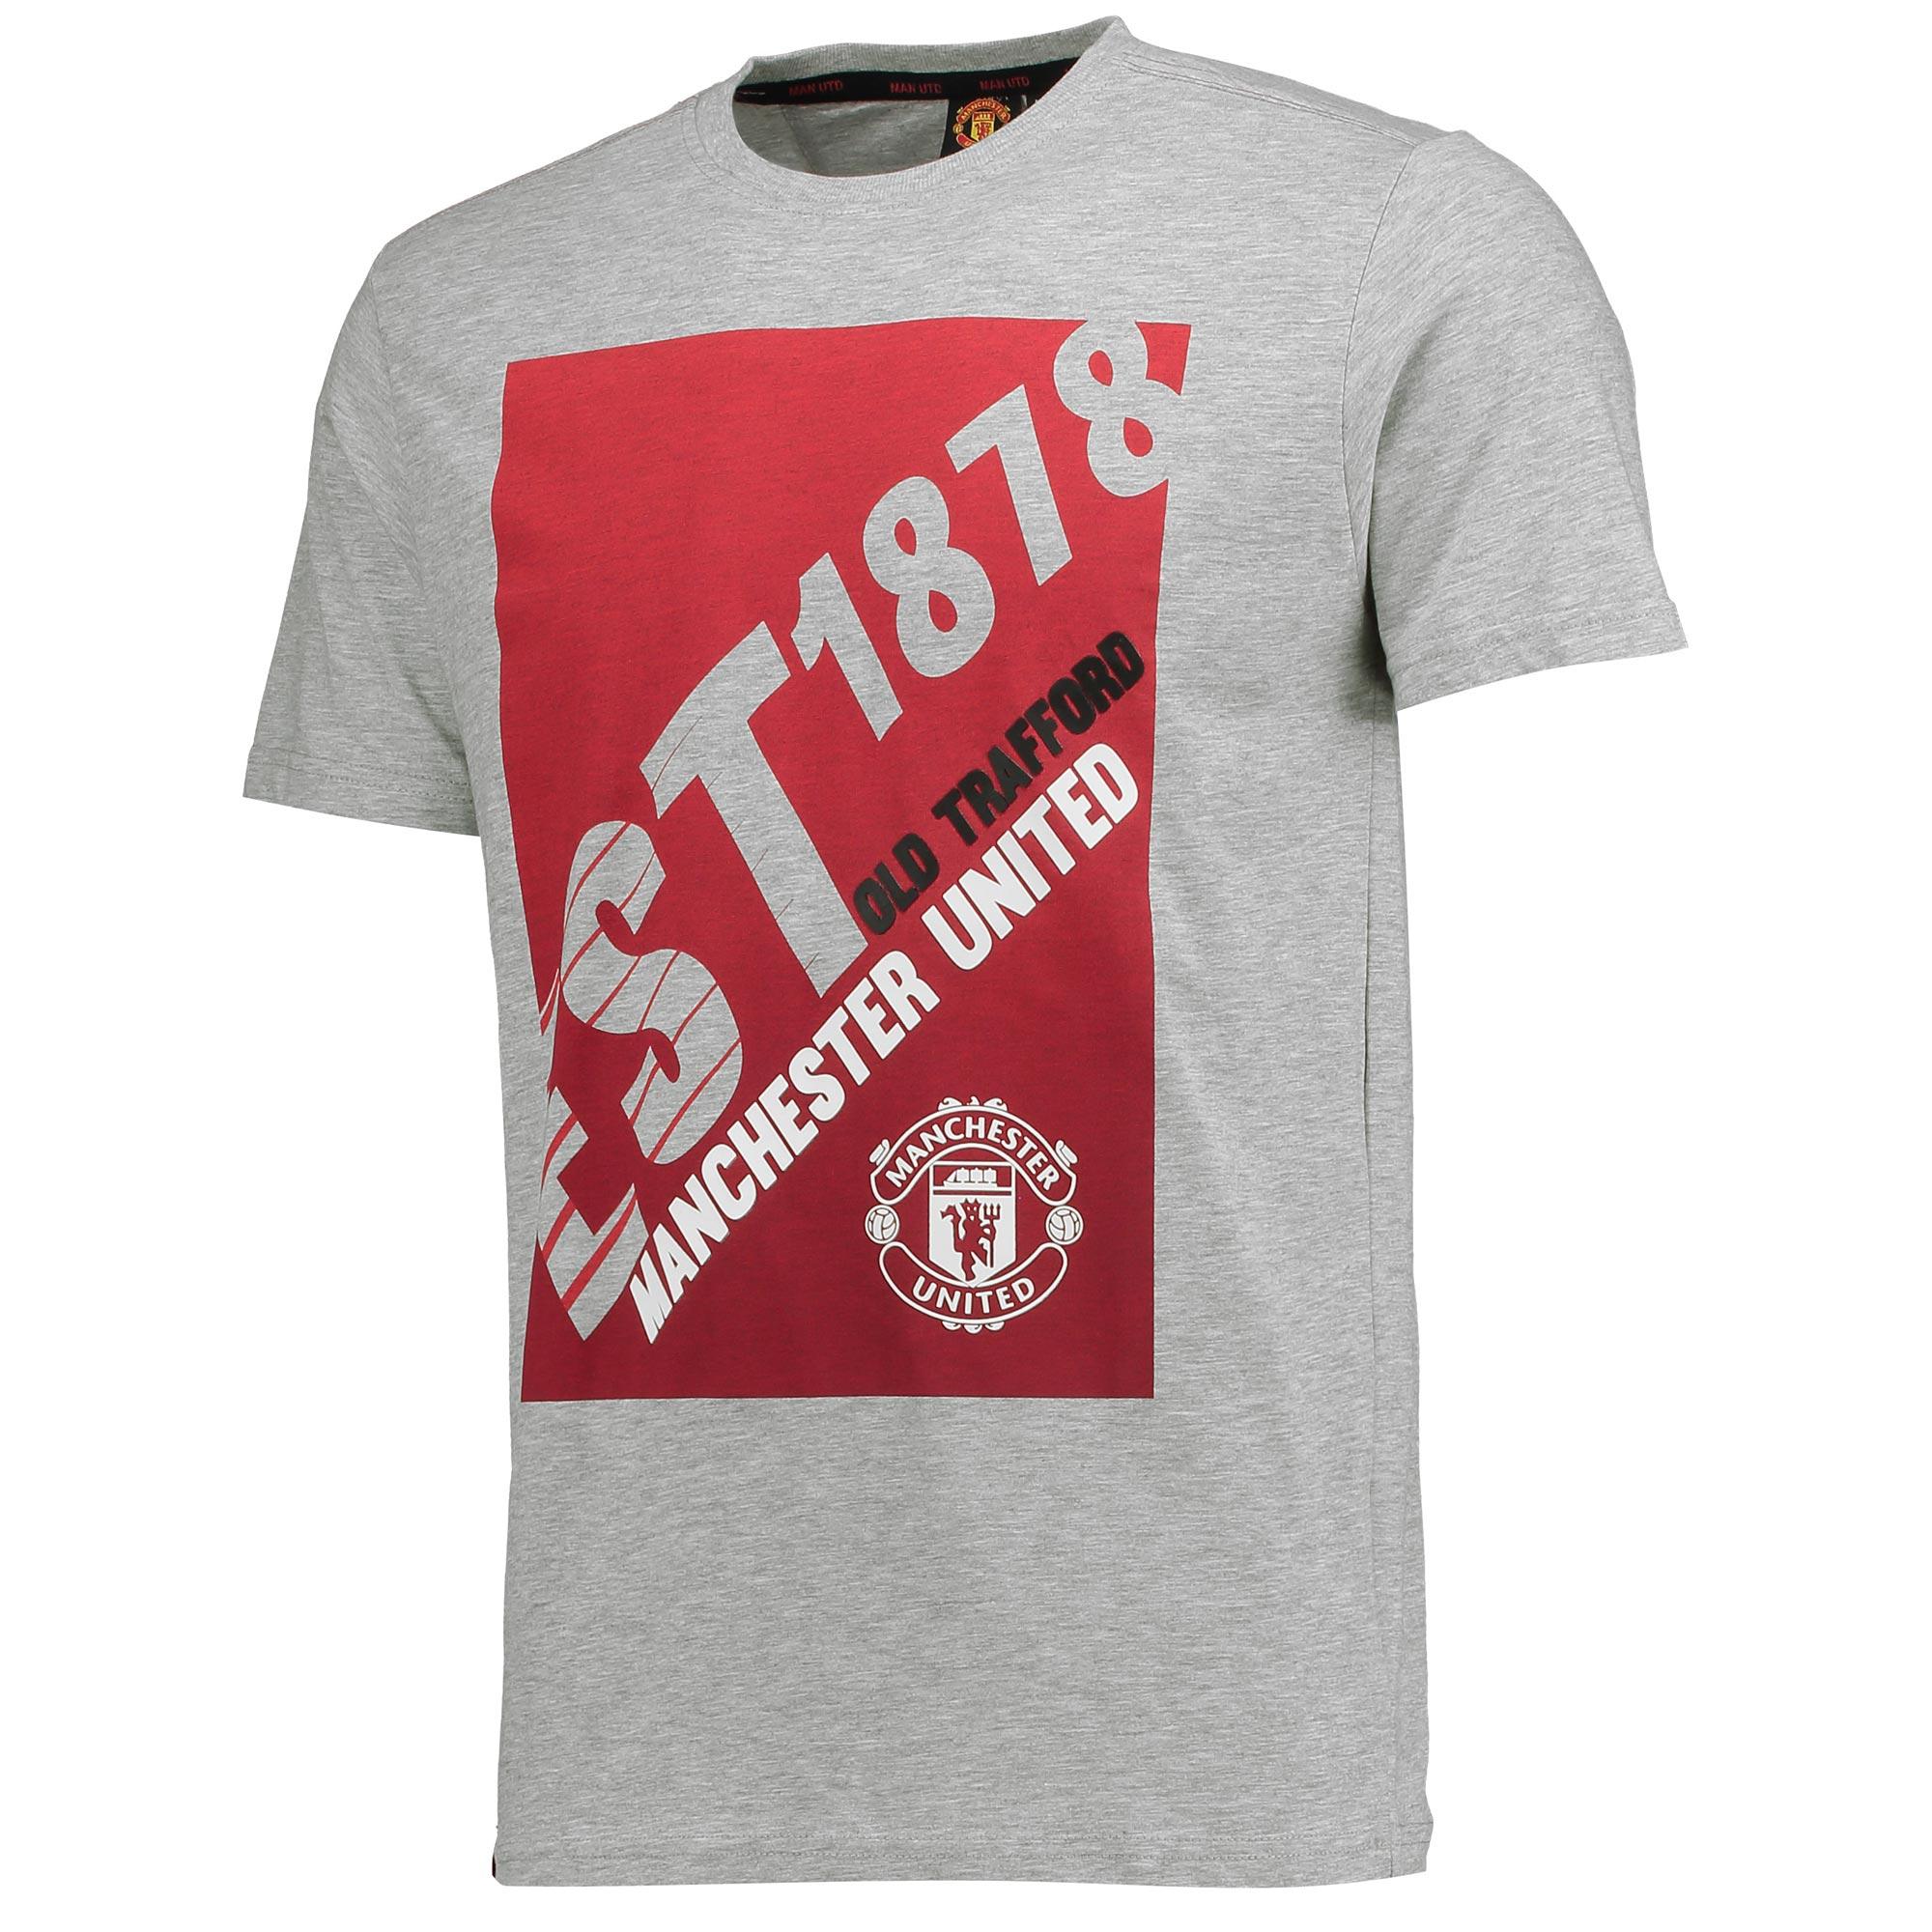 Manchester United Essential Est 1878 T-Shirt - Grey - Mens